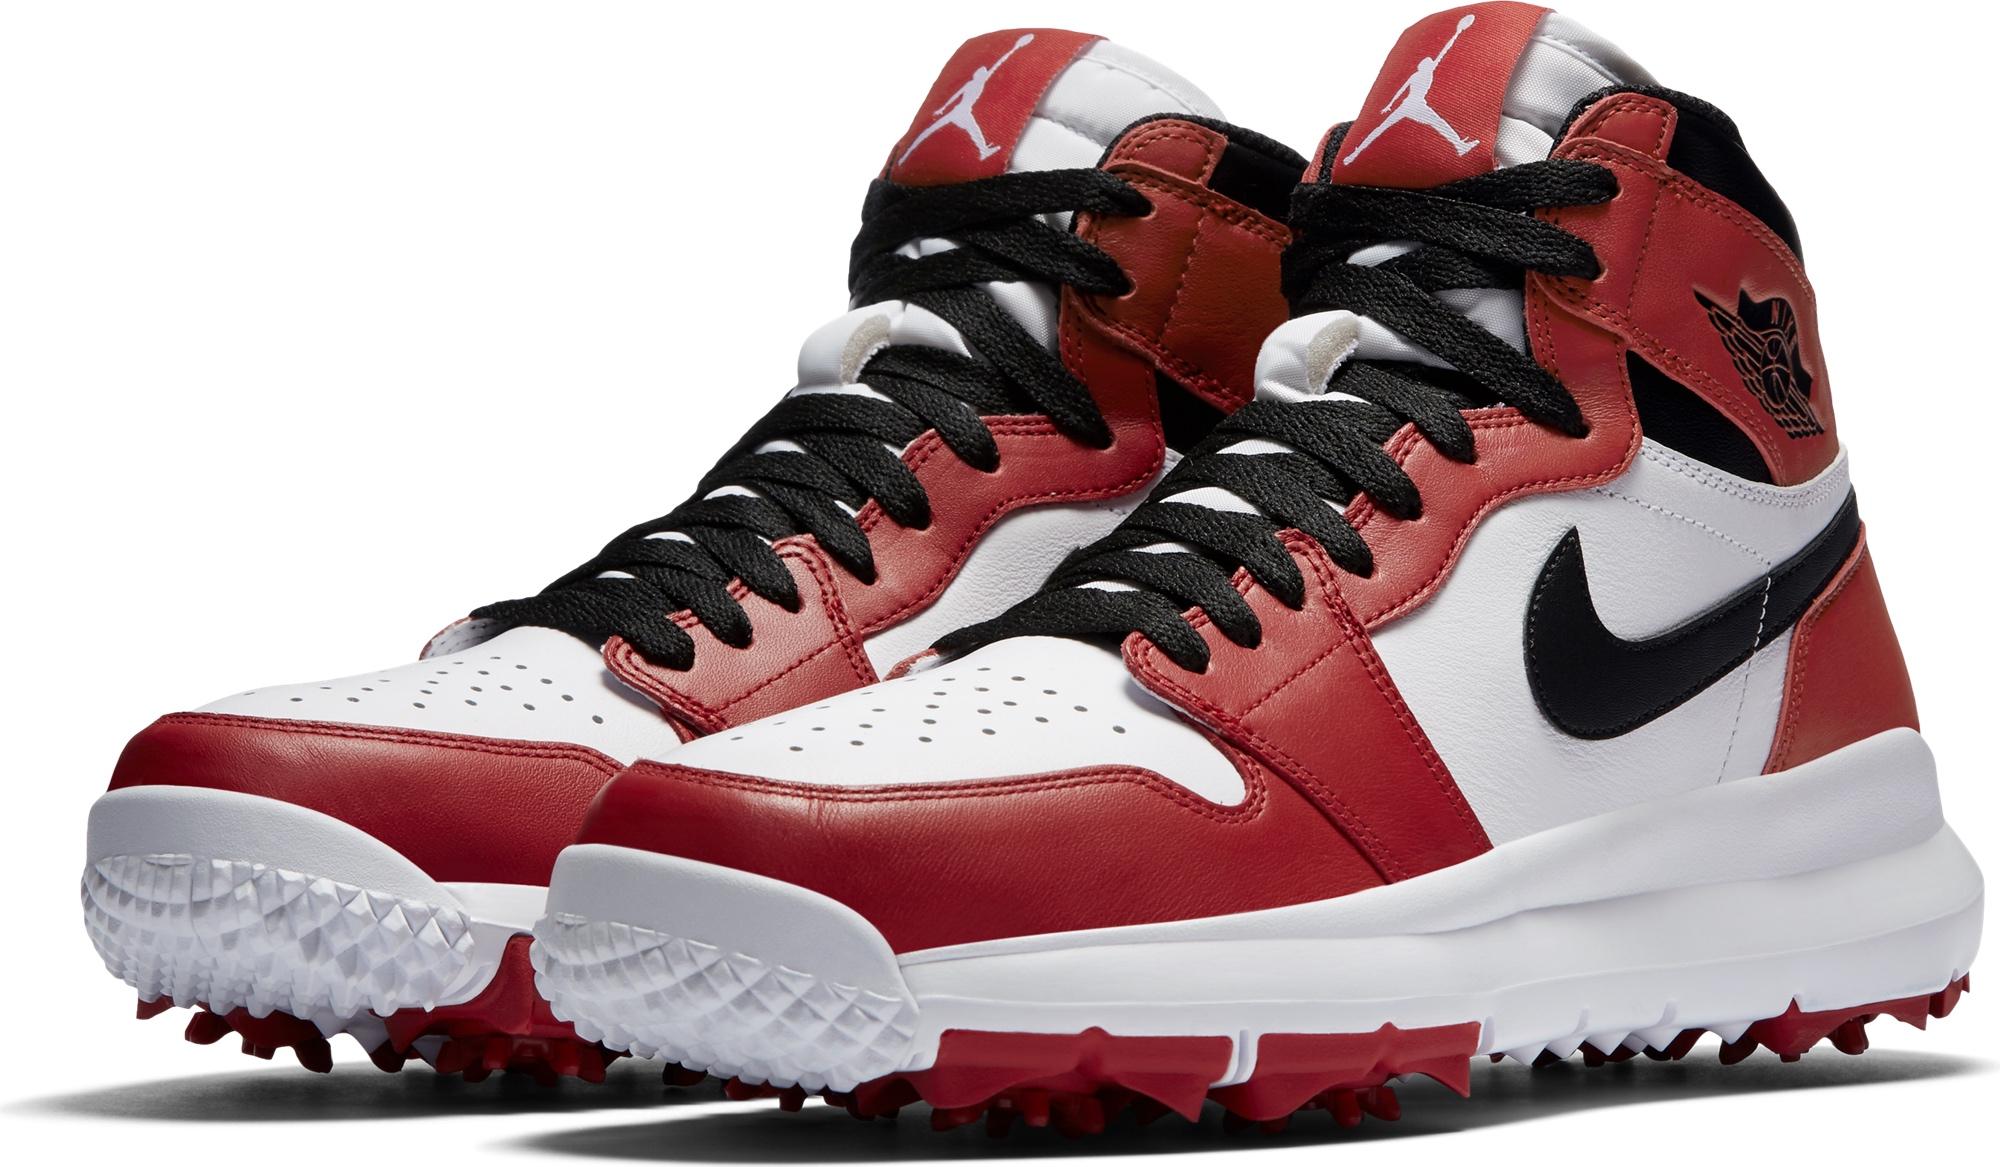 Jordan De Chaussure Original Basketball Nike uOZTPXwkil